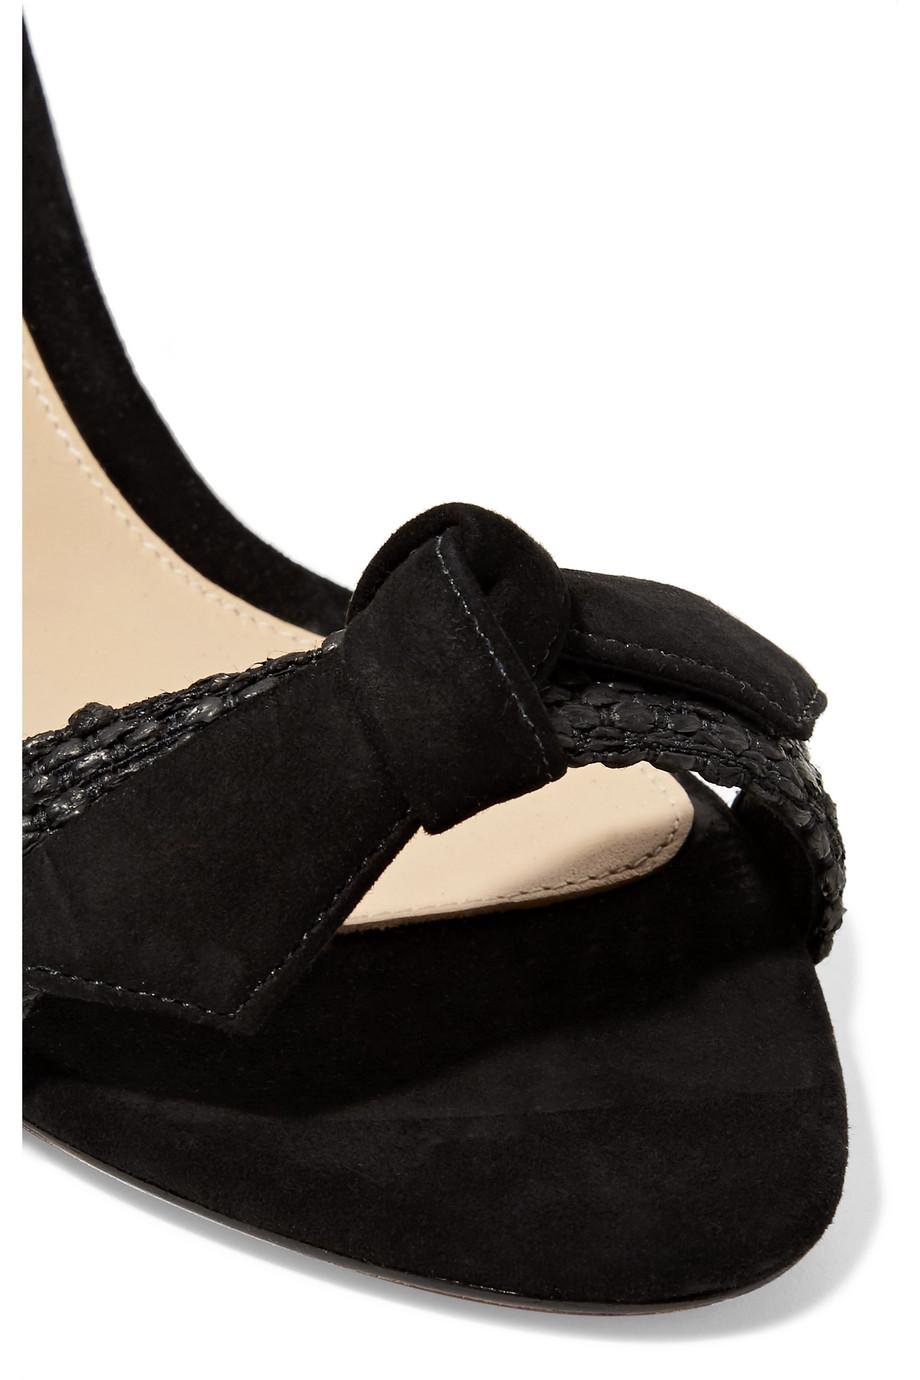 Clarita Bow-embellished Suede And Raffia Espadrille Wedge Sandals - Black Alexandre Birman Dw3QfDgDp